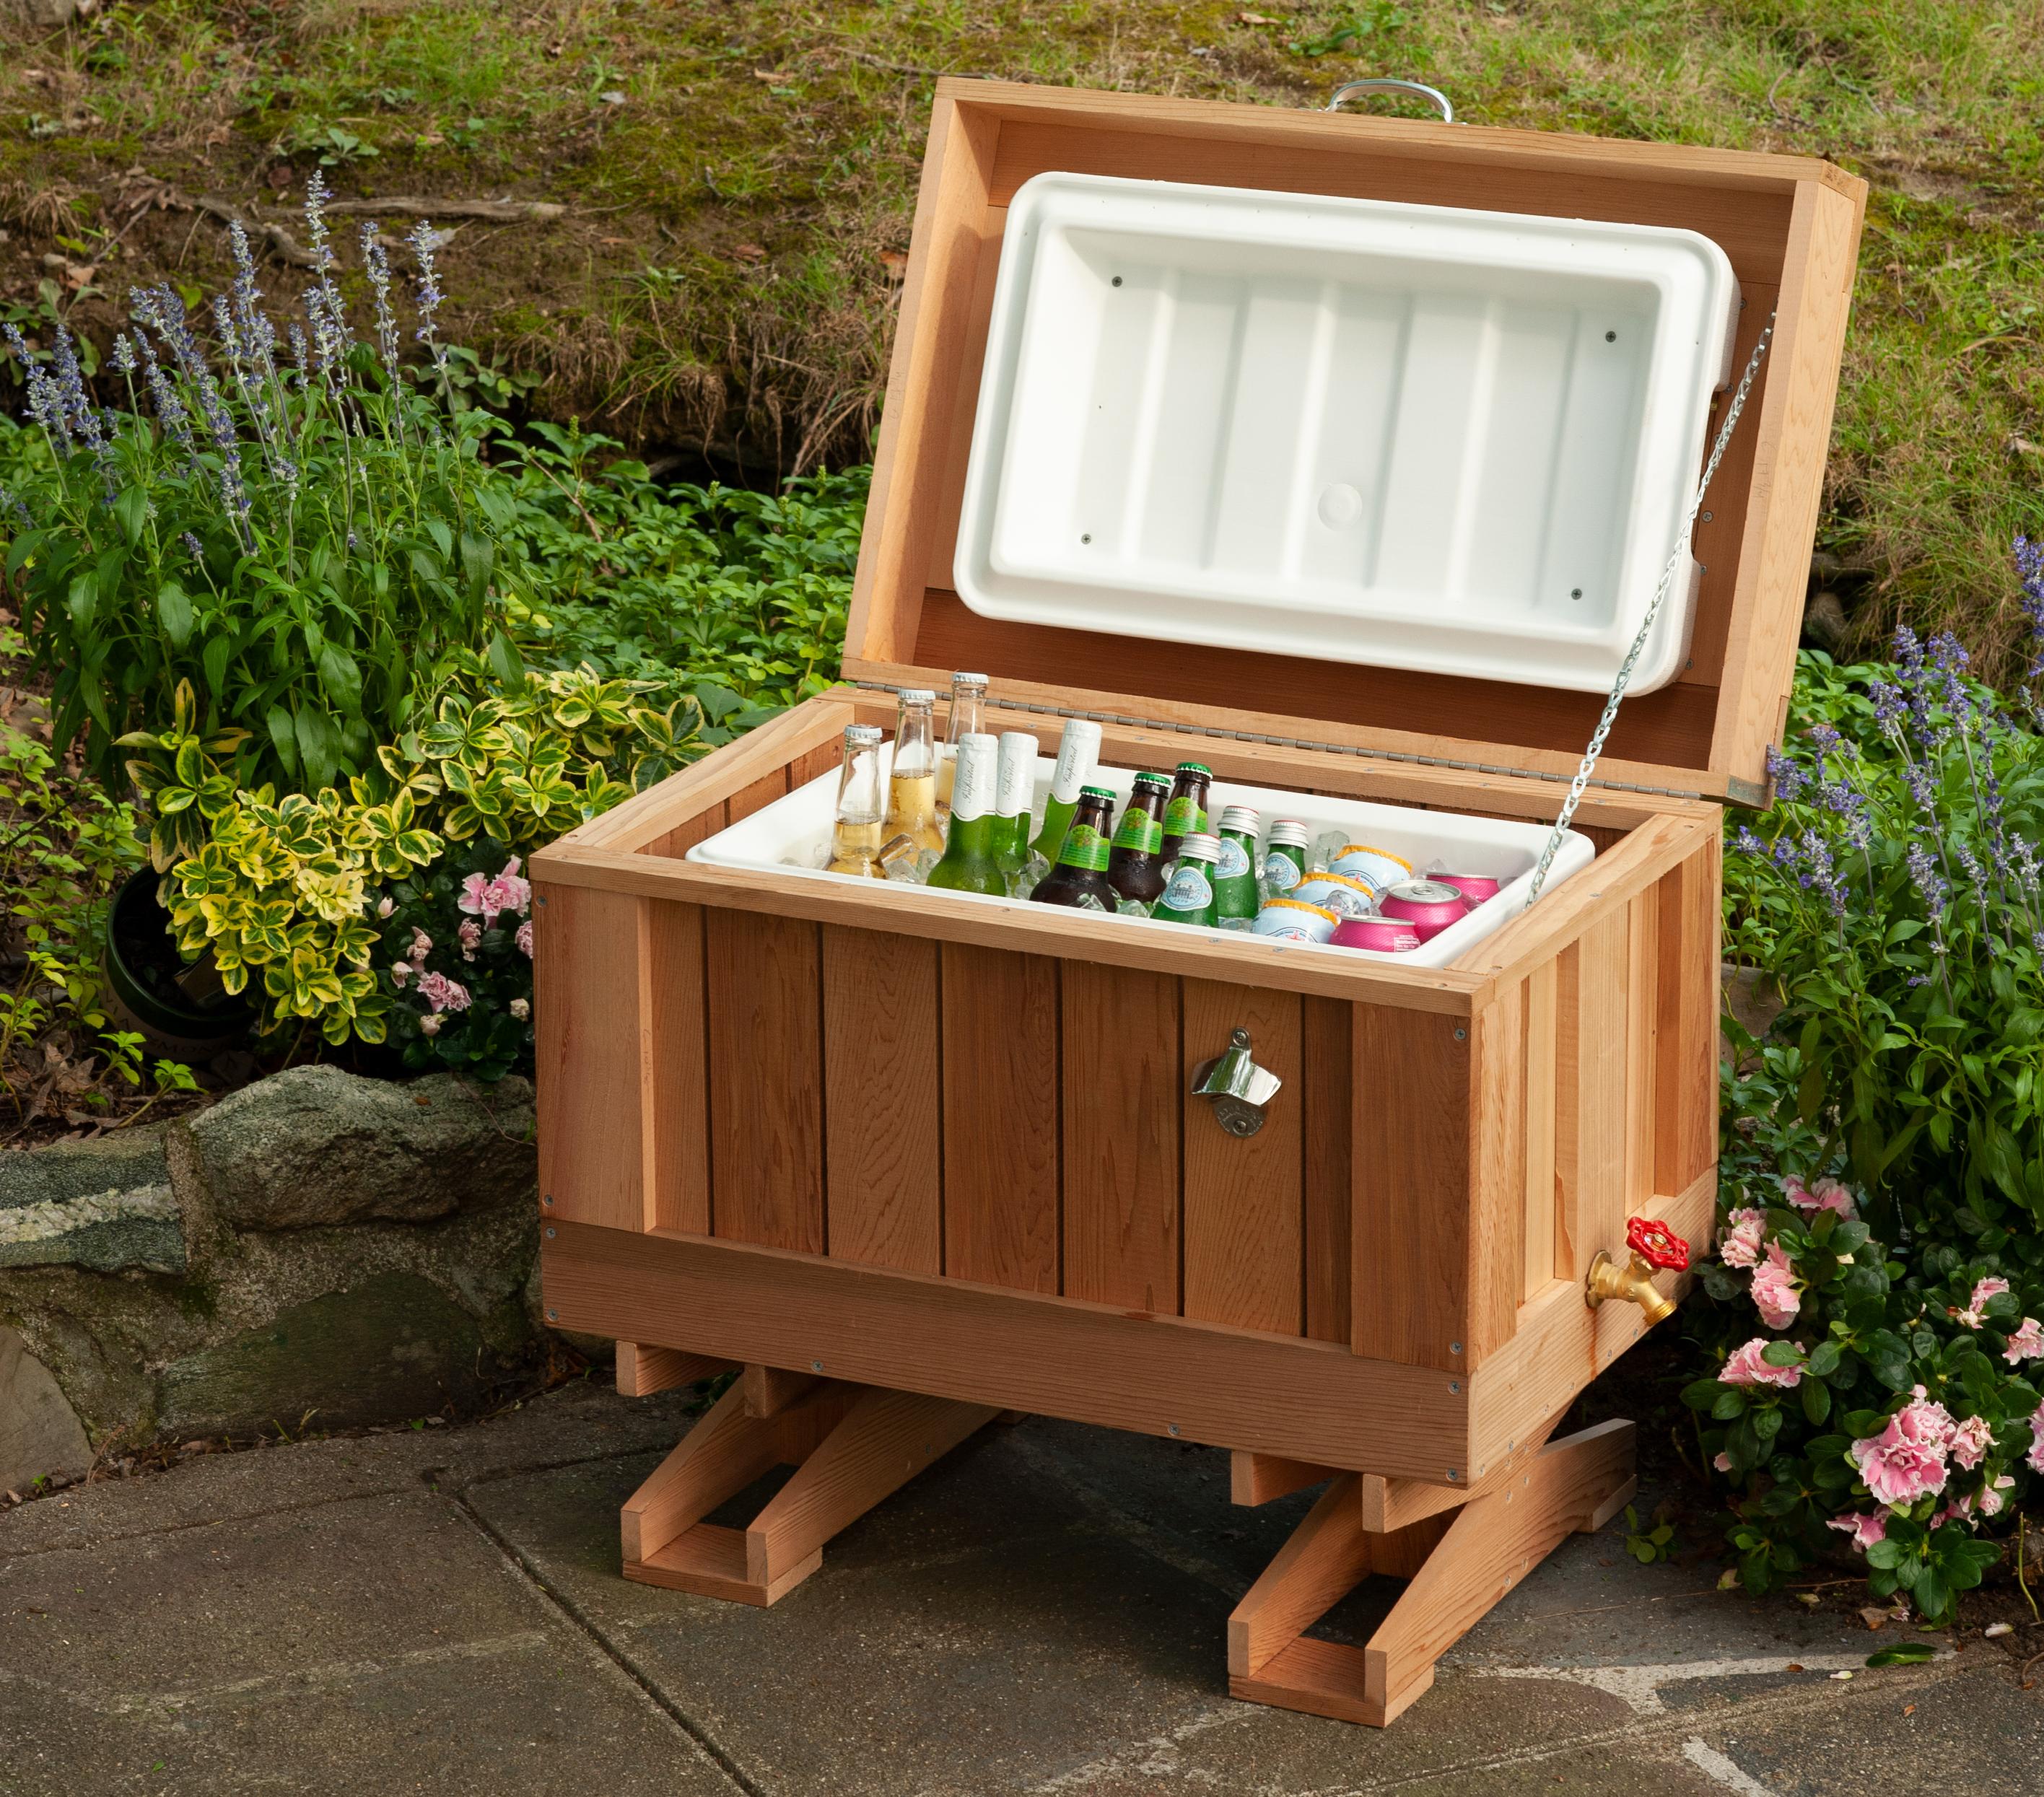 Cedar cooler